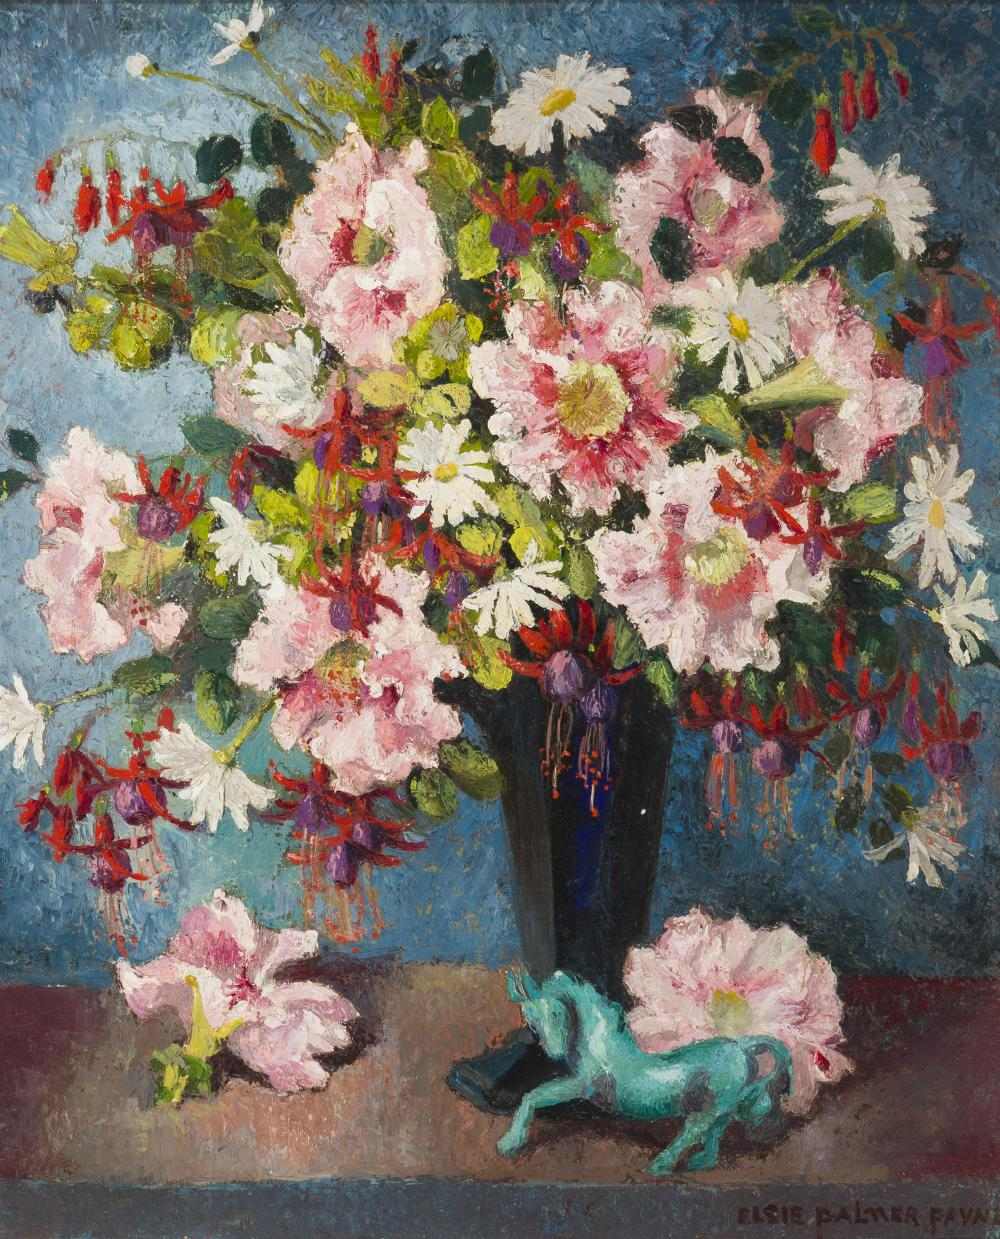 "Elsie Palmer Payne, (1884-1971 Los Angeles, CA), ""Petunias, Fuchsias & Daisies"", Oil on canvas laid to waxed canvas, 24"" H x 20"" W"